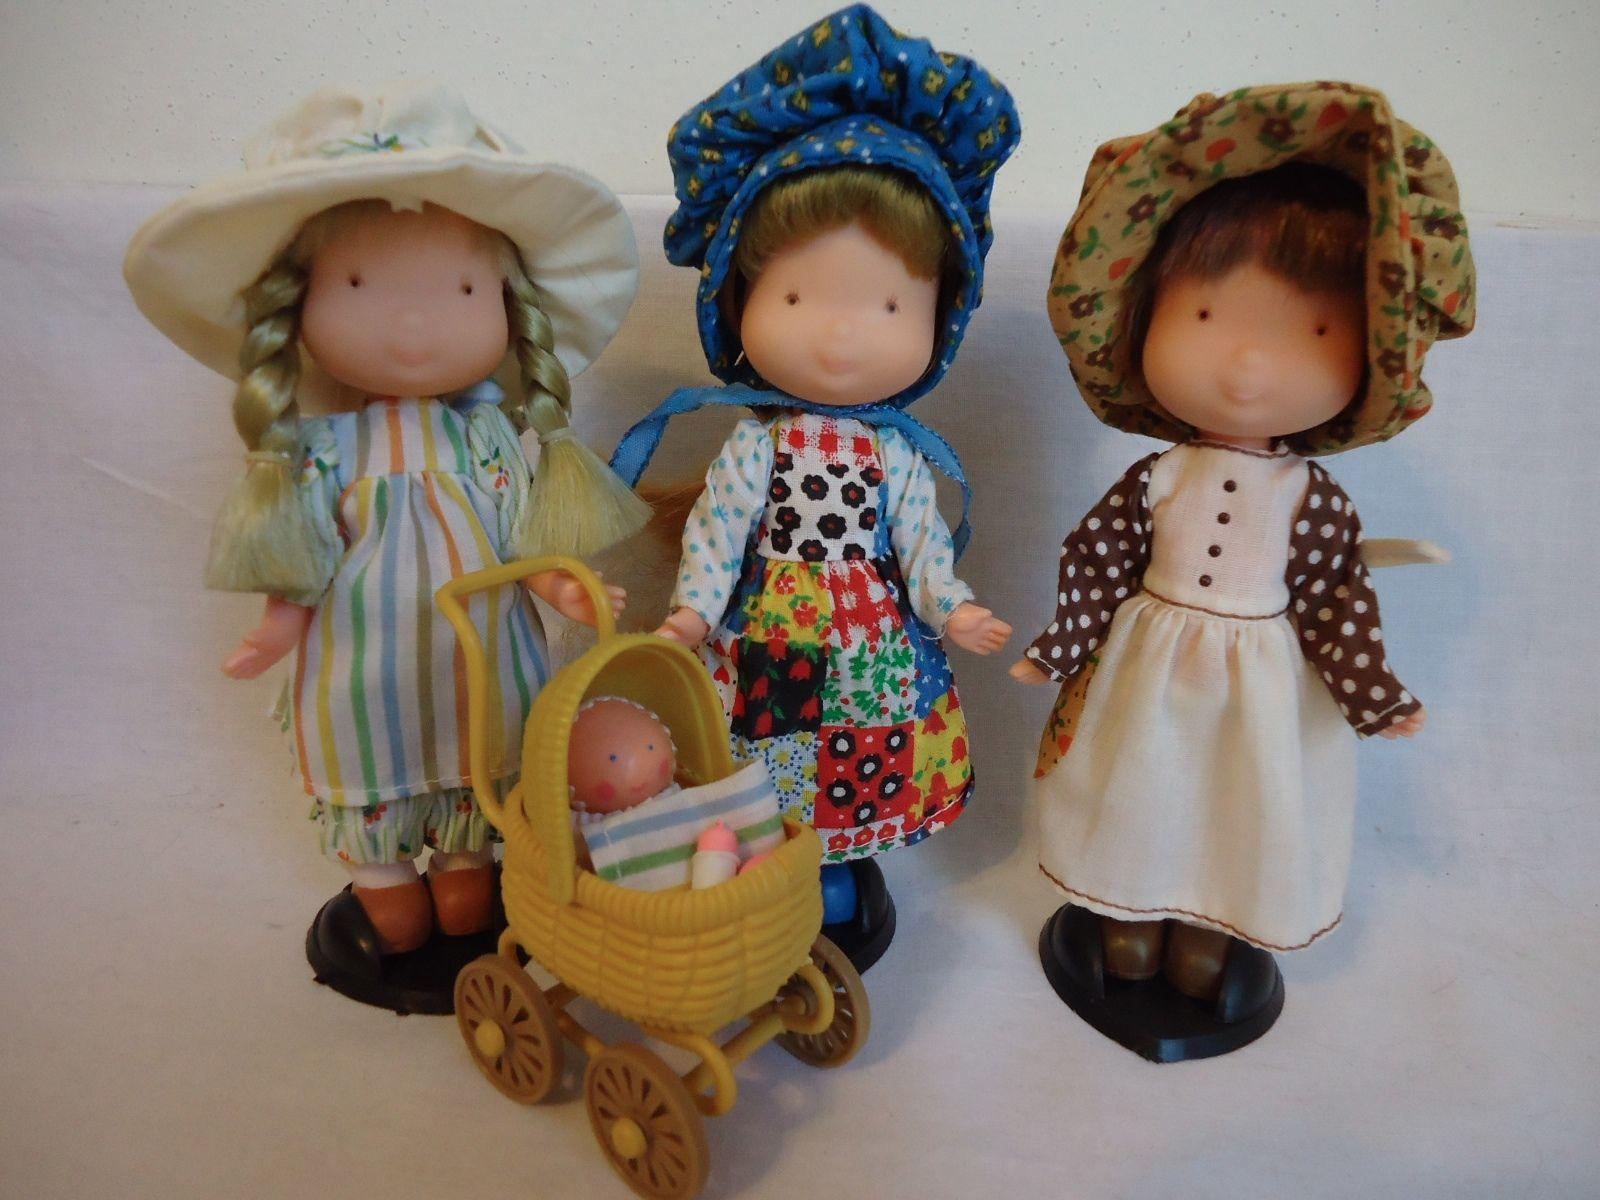 3 Vintage Holly Hobbie Dolls Knickerbocker Heather AMY